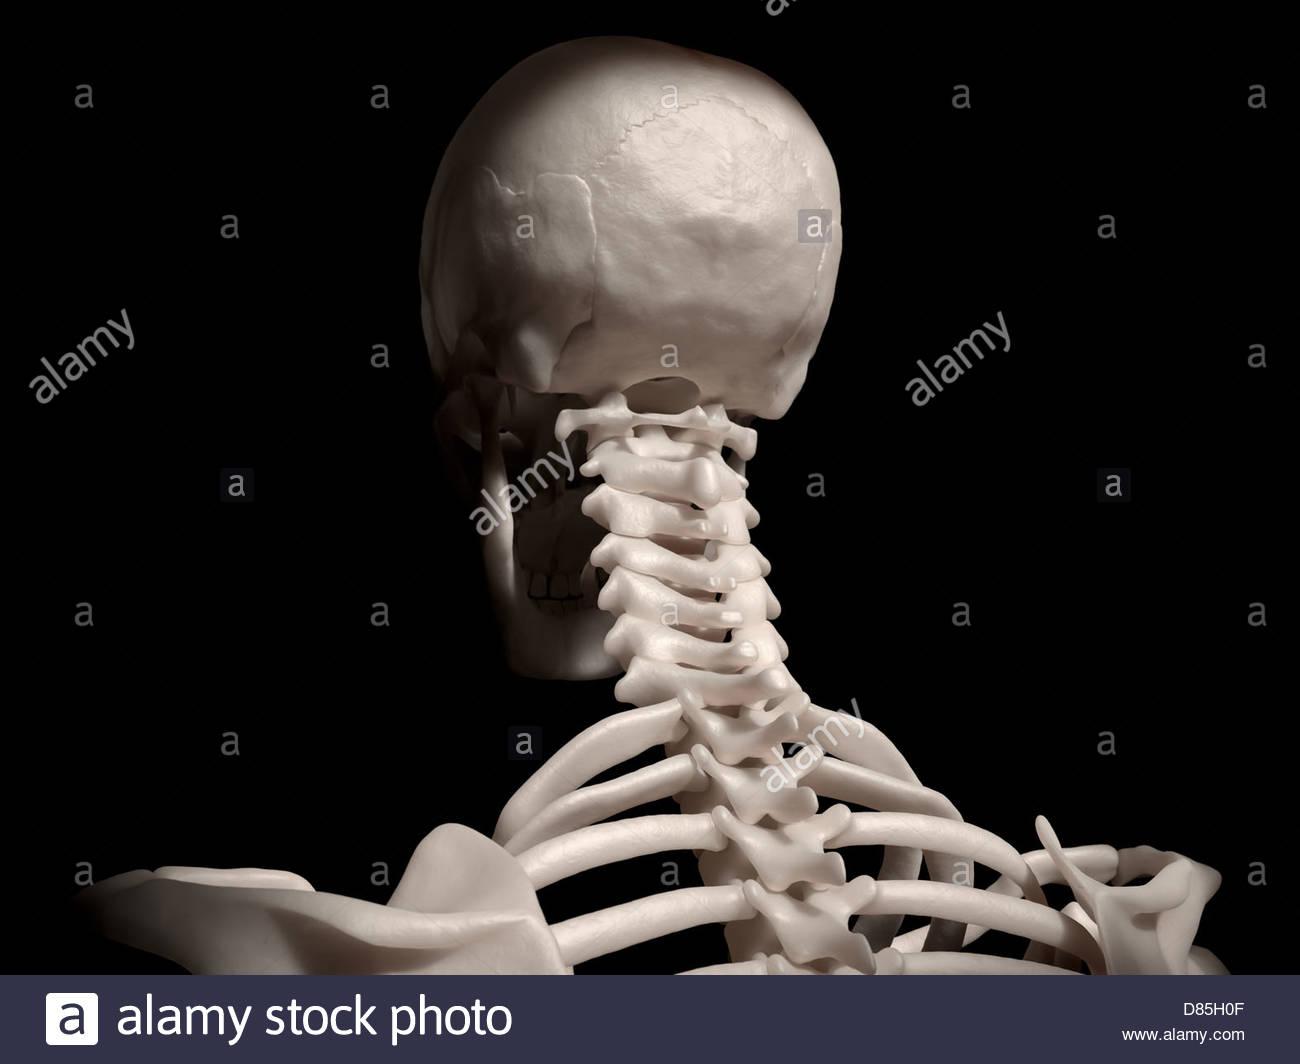 Digital Medical Illustration Posterior Back View Of Human Skull